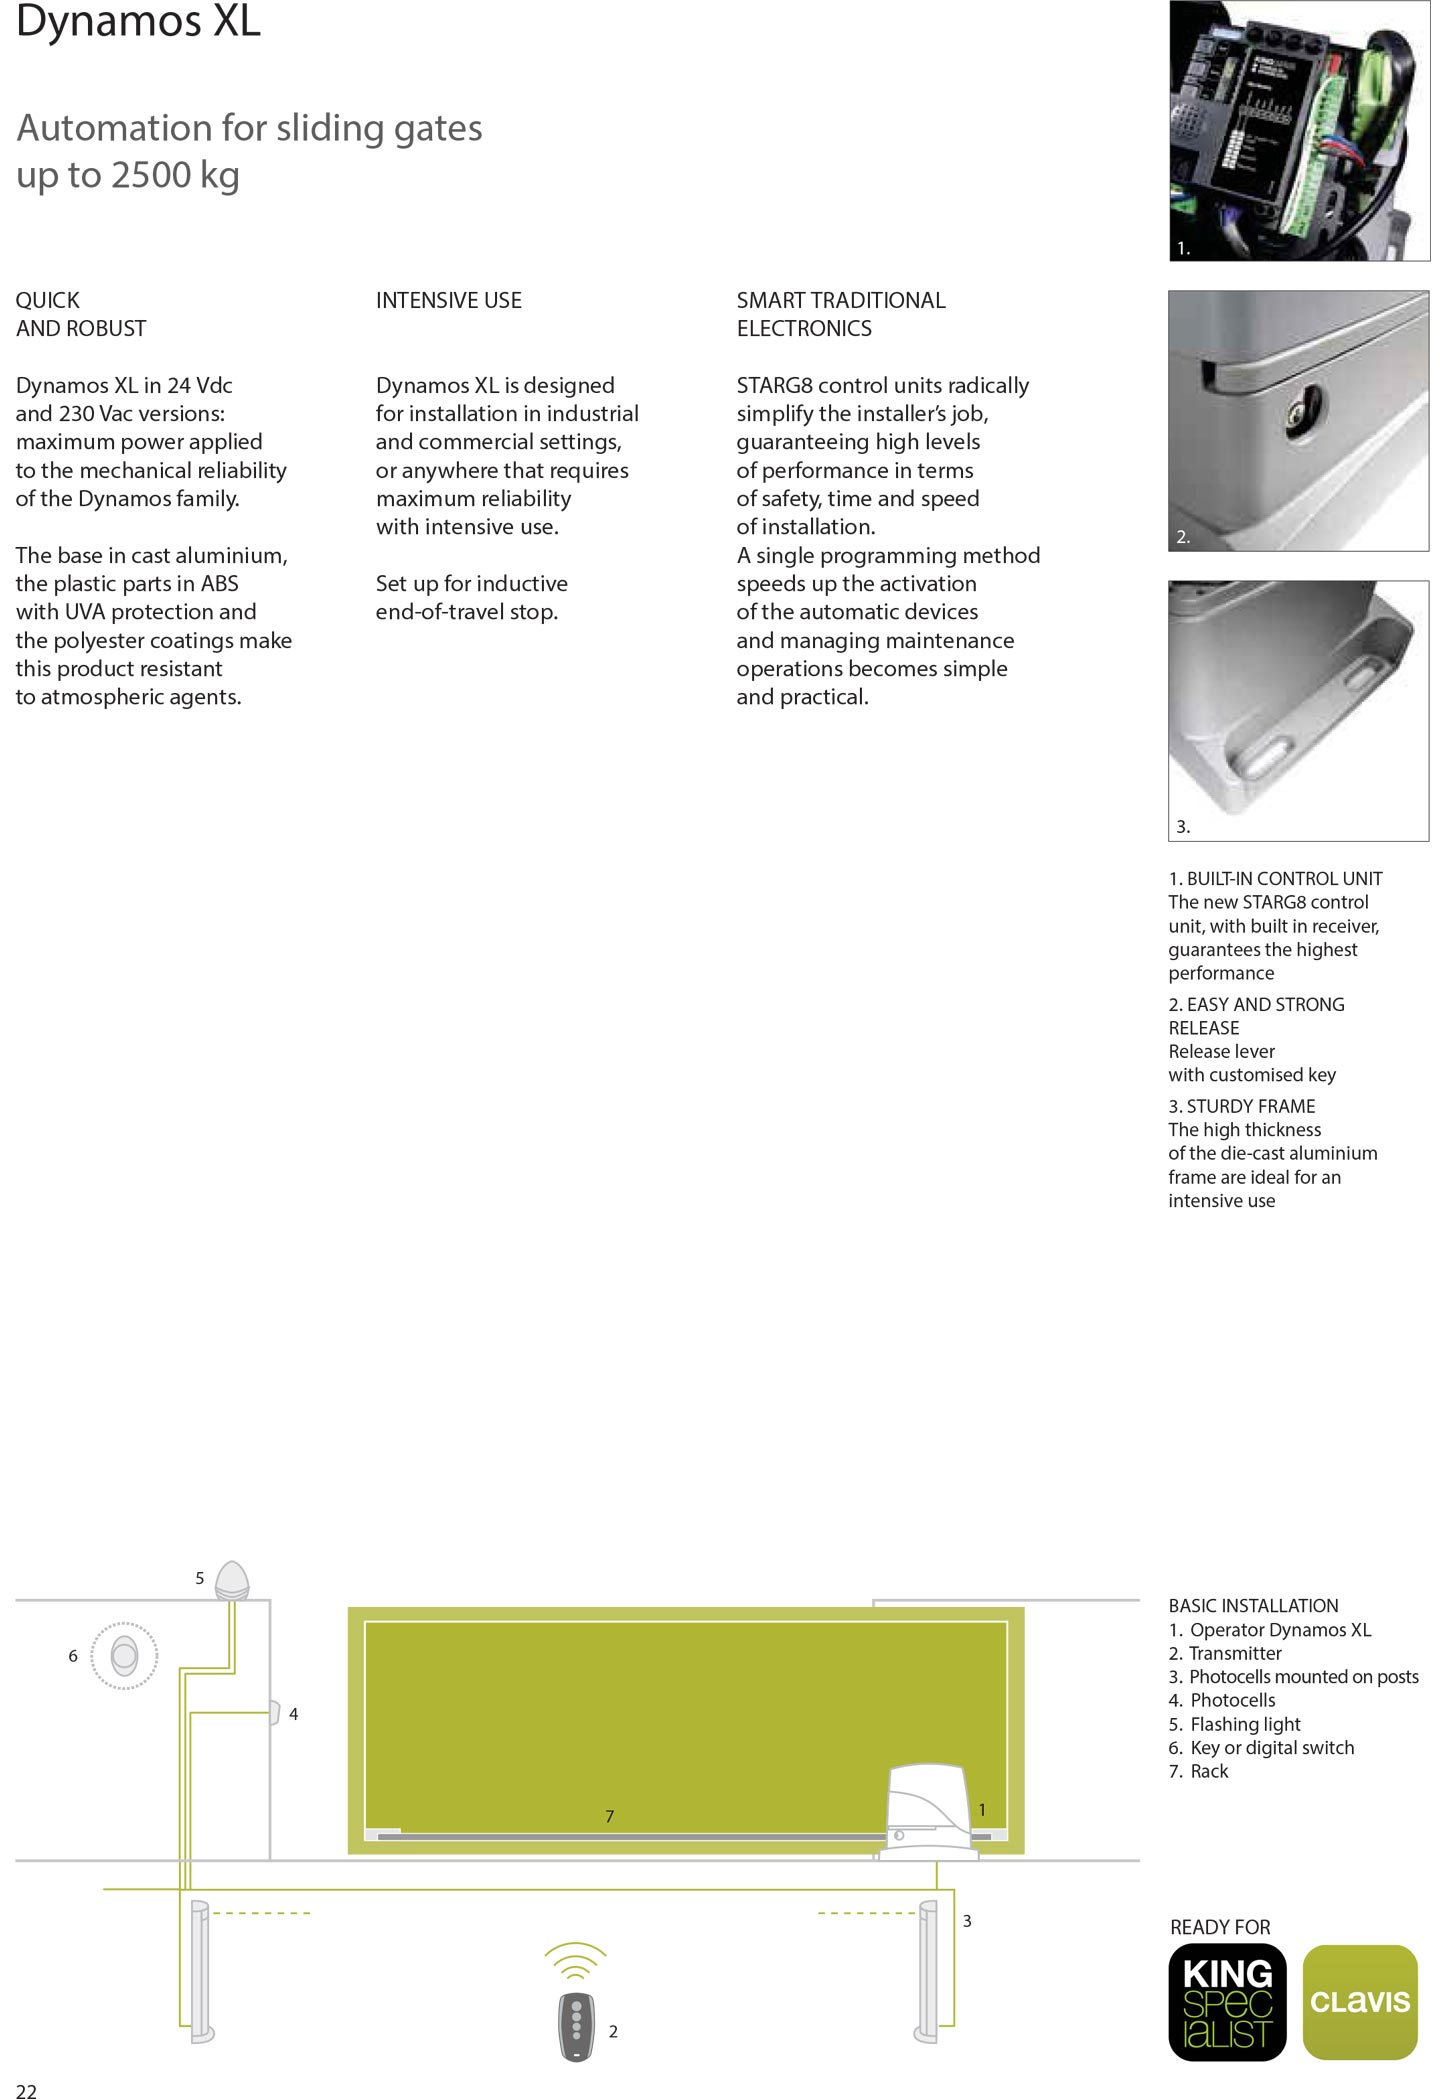 automatic gate, automatic sliding gate, factory sliding gate, factory fence gate, remote control gate, smart control gate, phone gsm bluetooth gate, solar motor gate